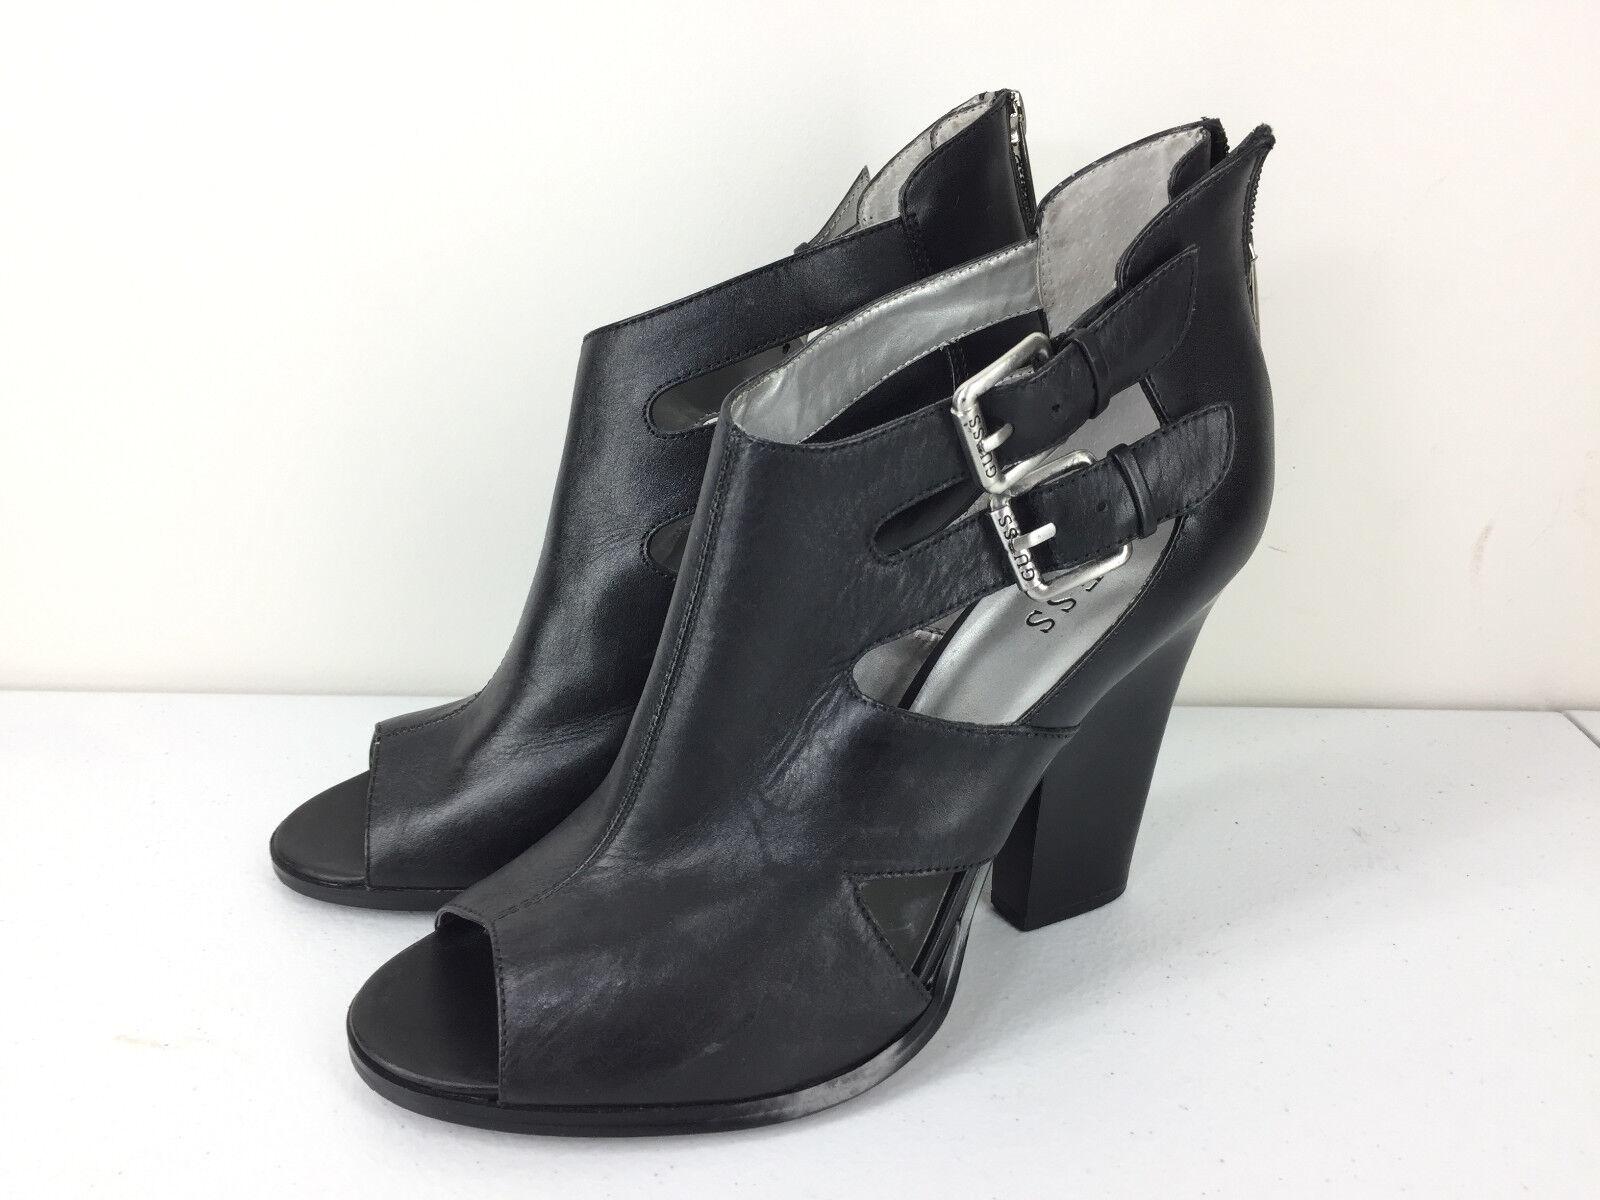 Guess 10 Black Leather Peep Toe High Heel Booties sandals EUC